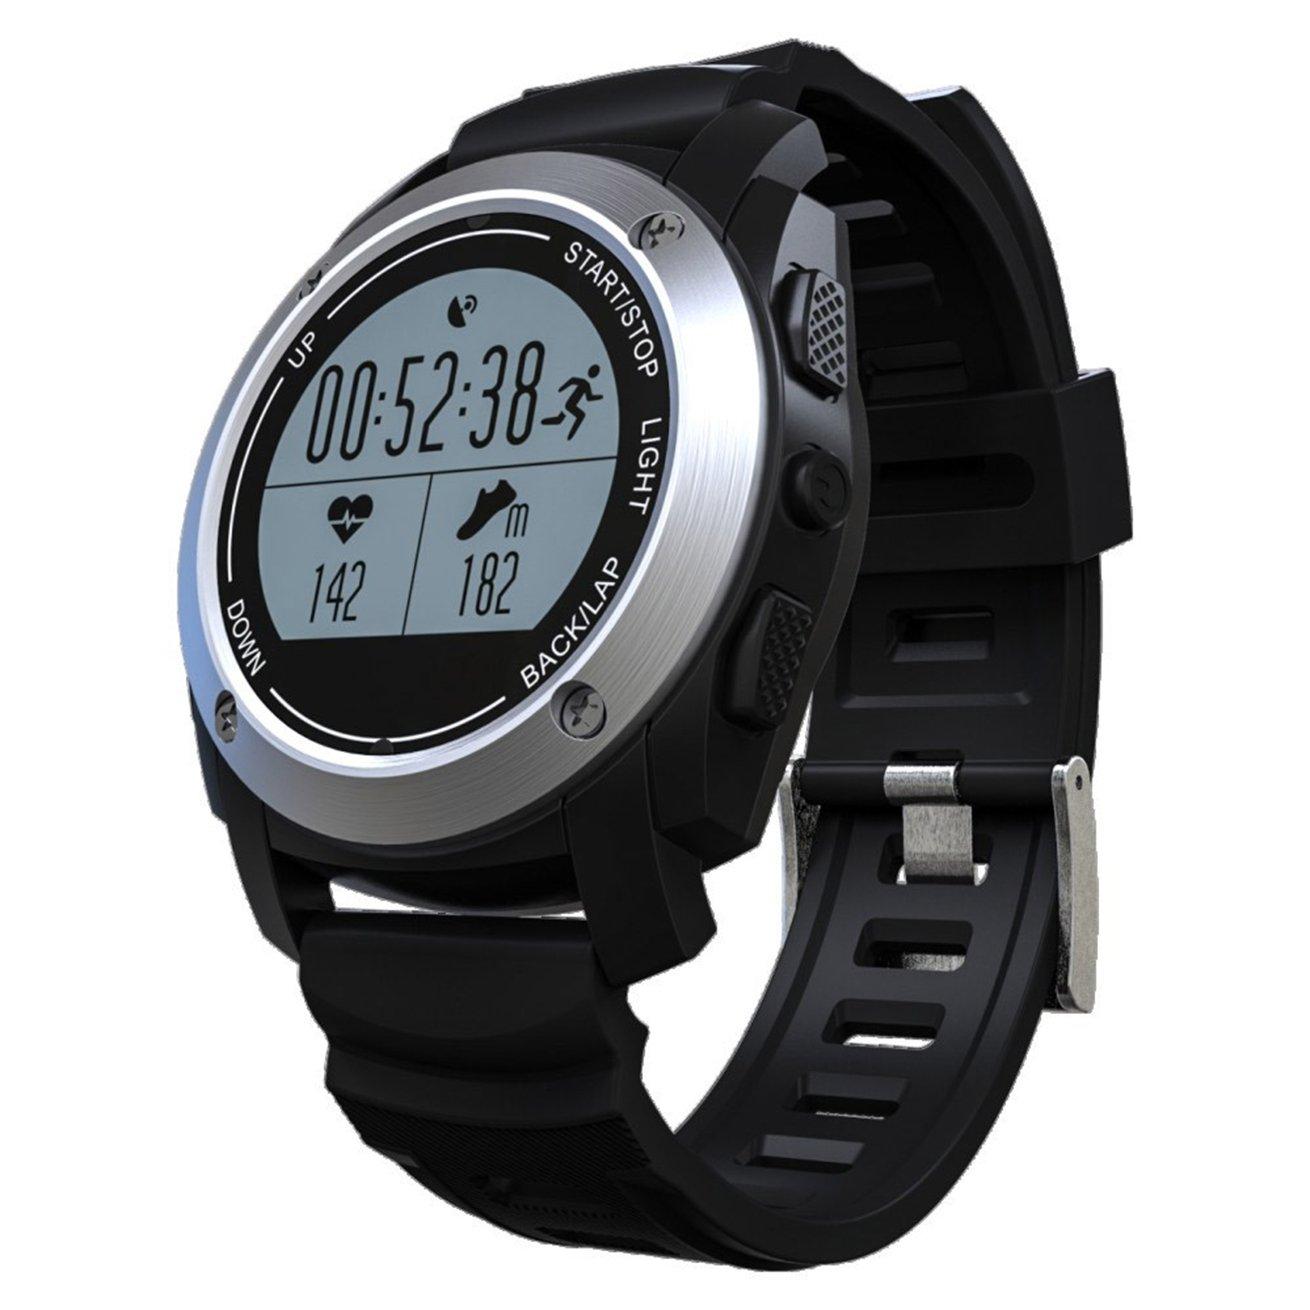 Smartwatch Tarjeta Sim Y GPS SD Tension Arterial TV Telefono ...